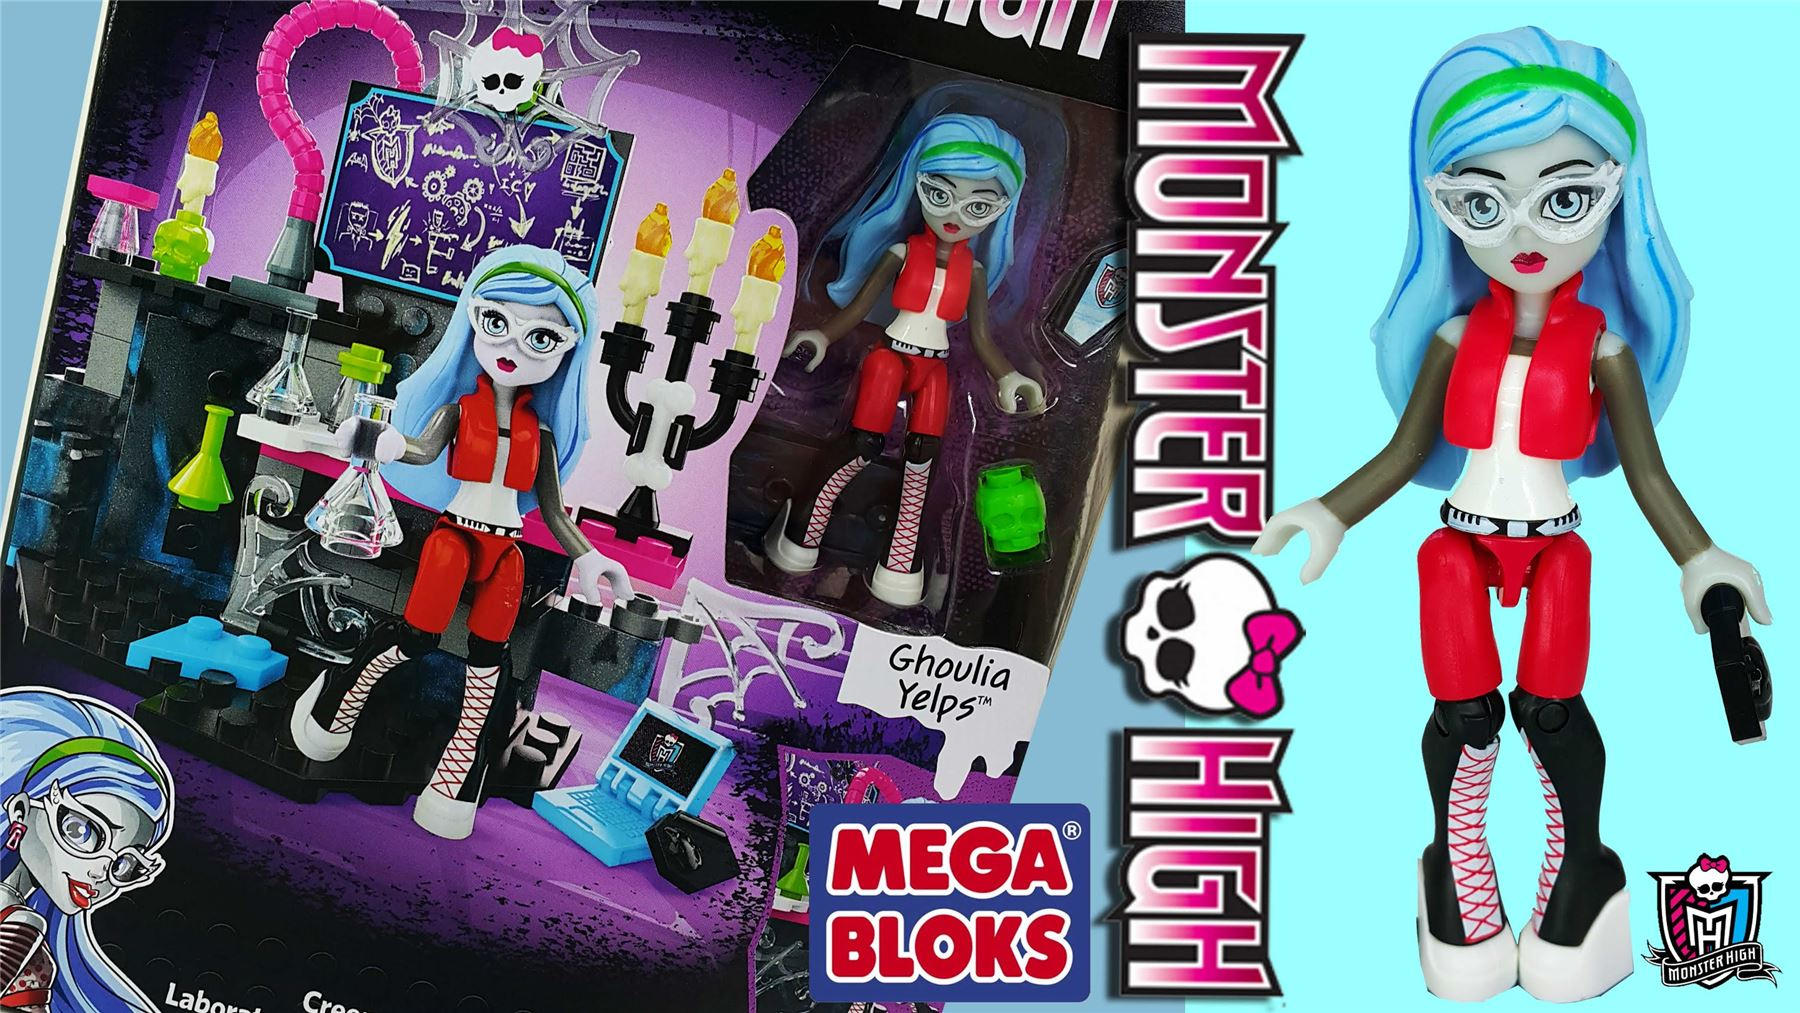 Mega bloks monster high personnage playsets quipe fear - Personnage monster high ...